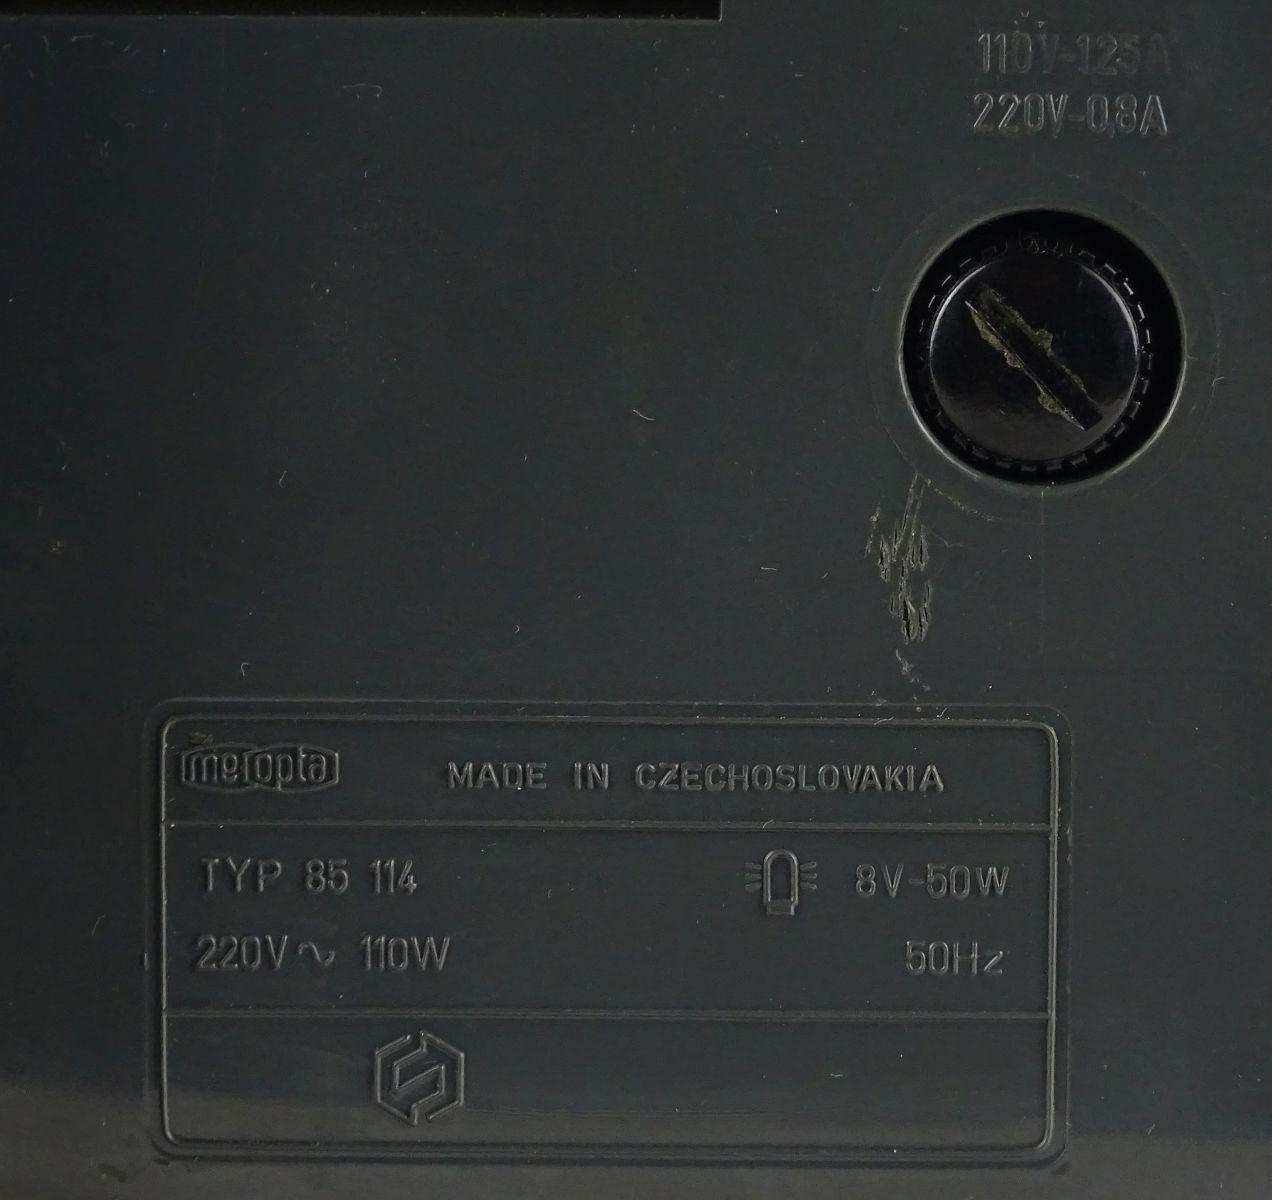 DSC00804.JPG (1272×1200)